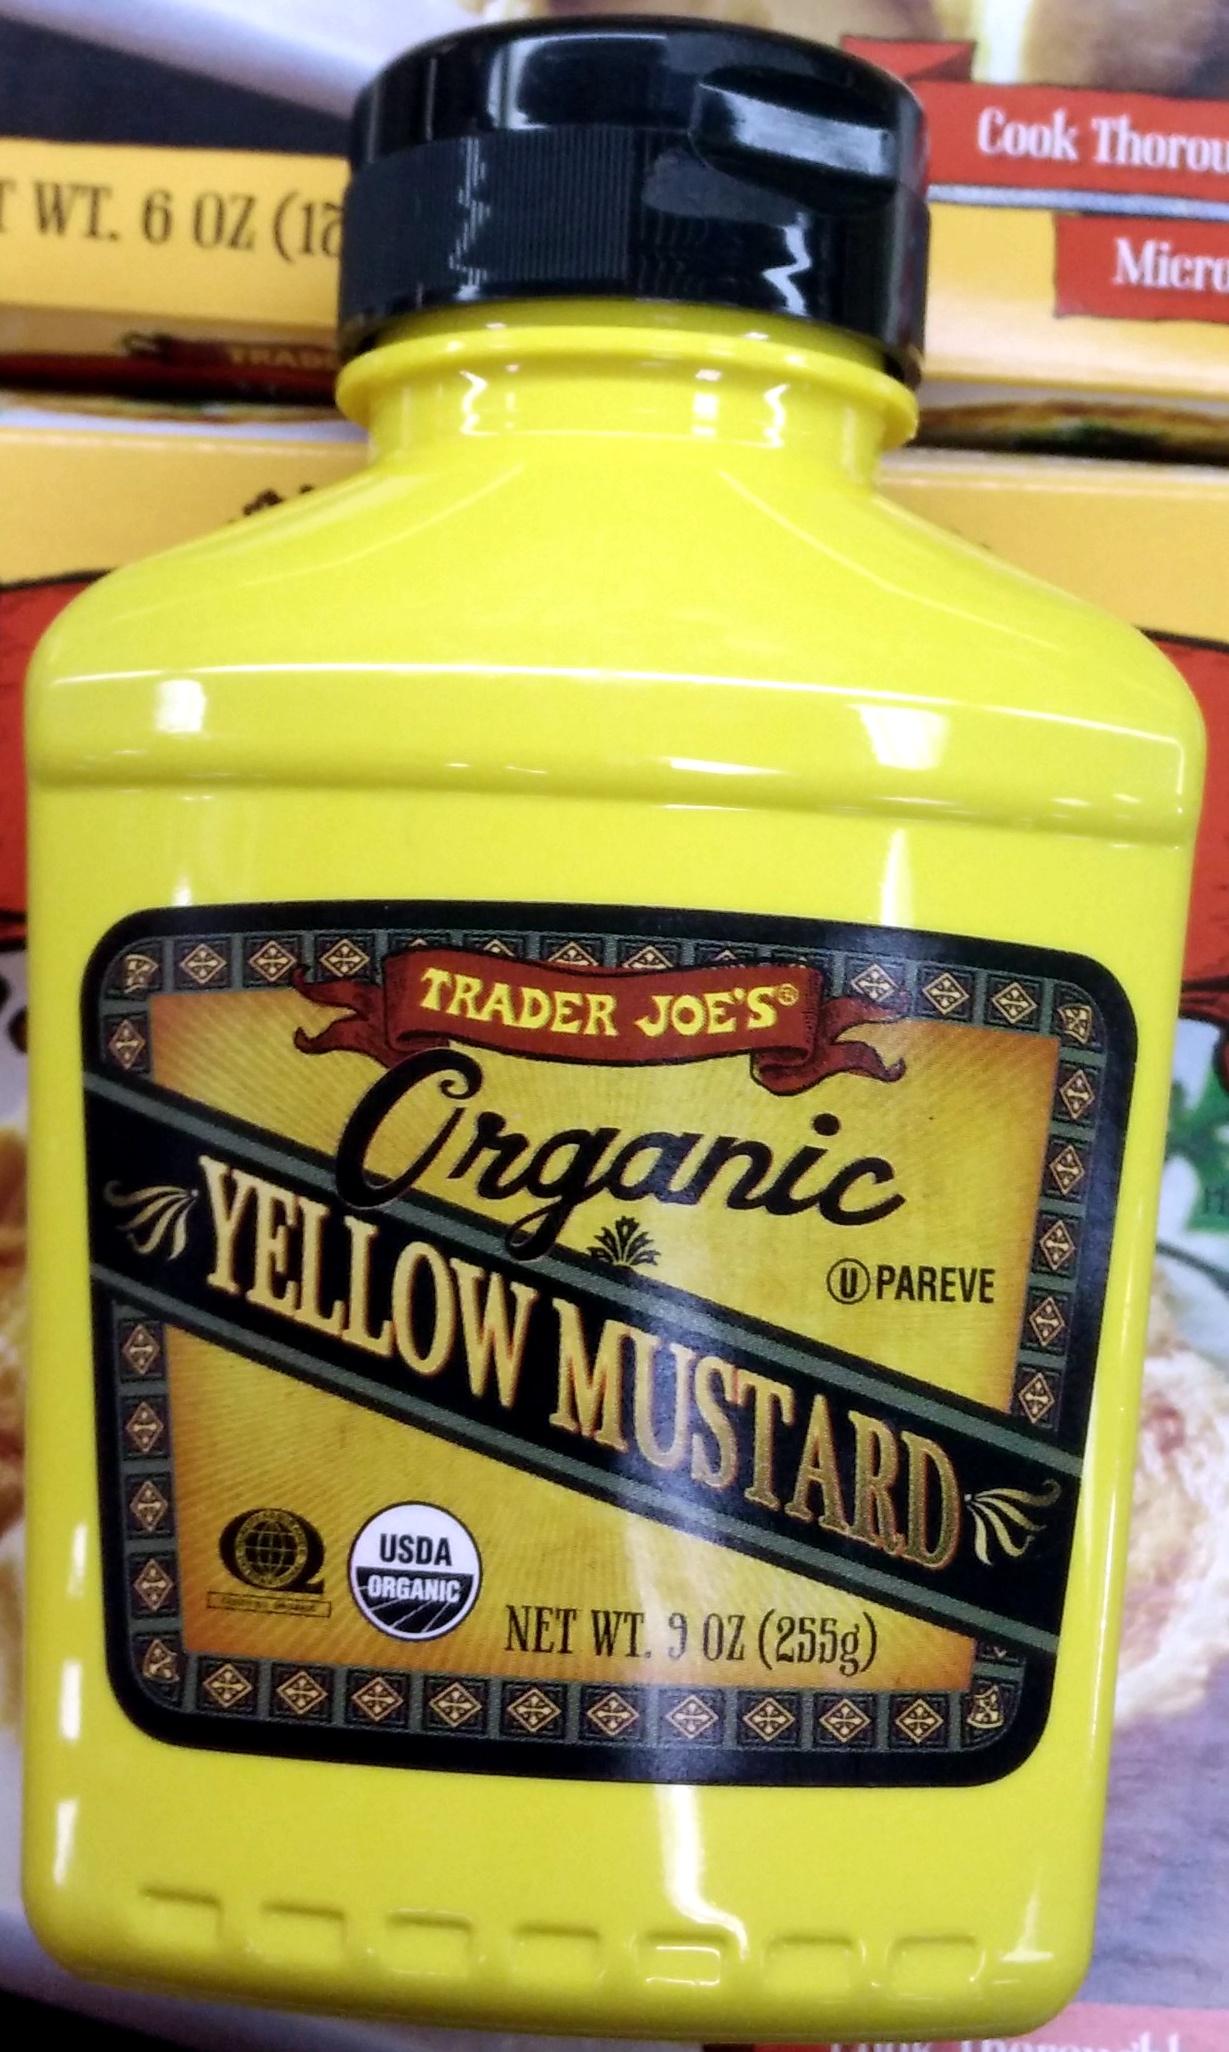 Trader joe's, organic yellow mustard - Product - en